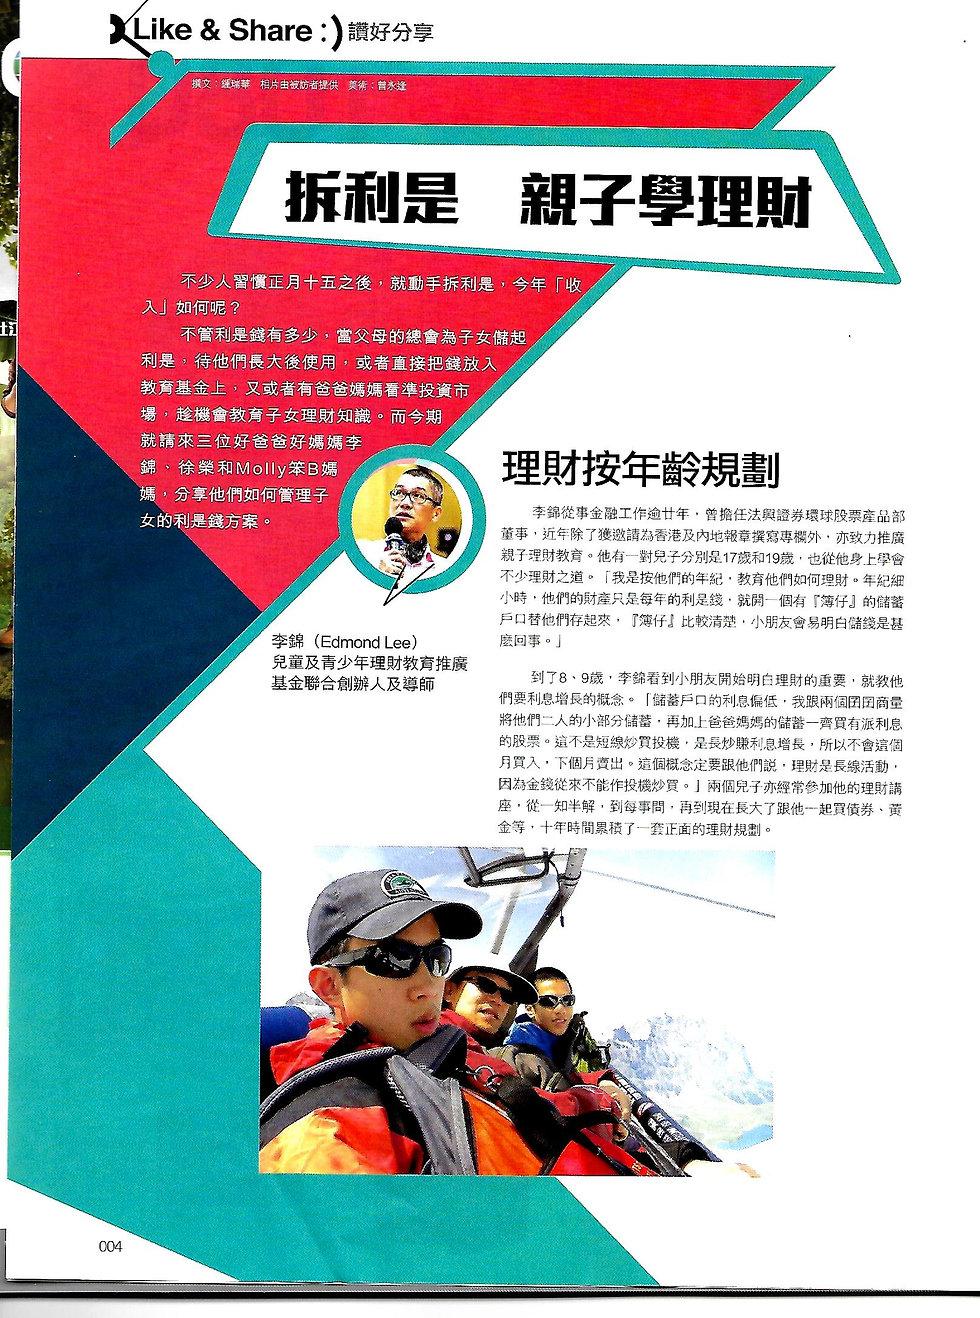 20180305_TVB周刊.jpg